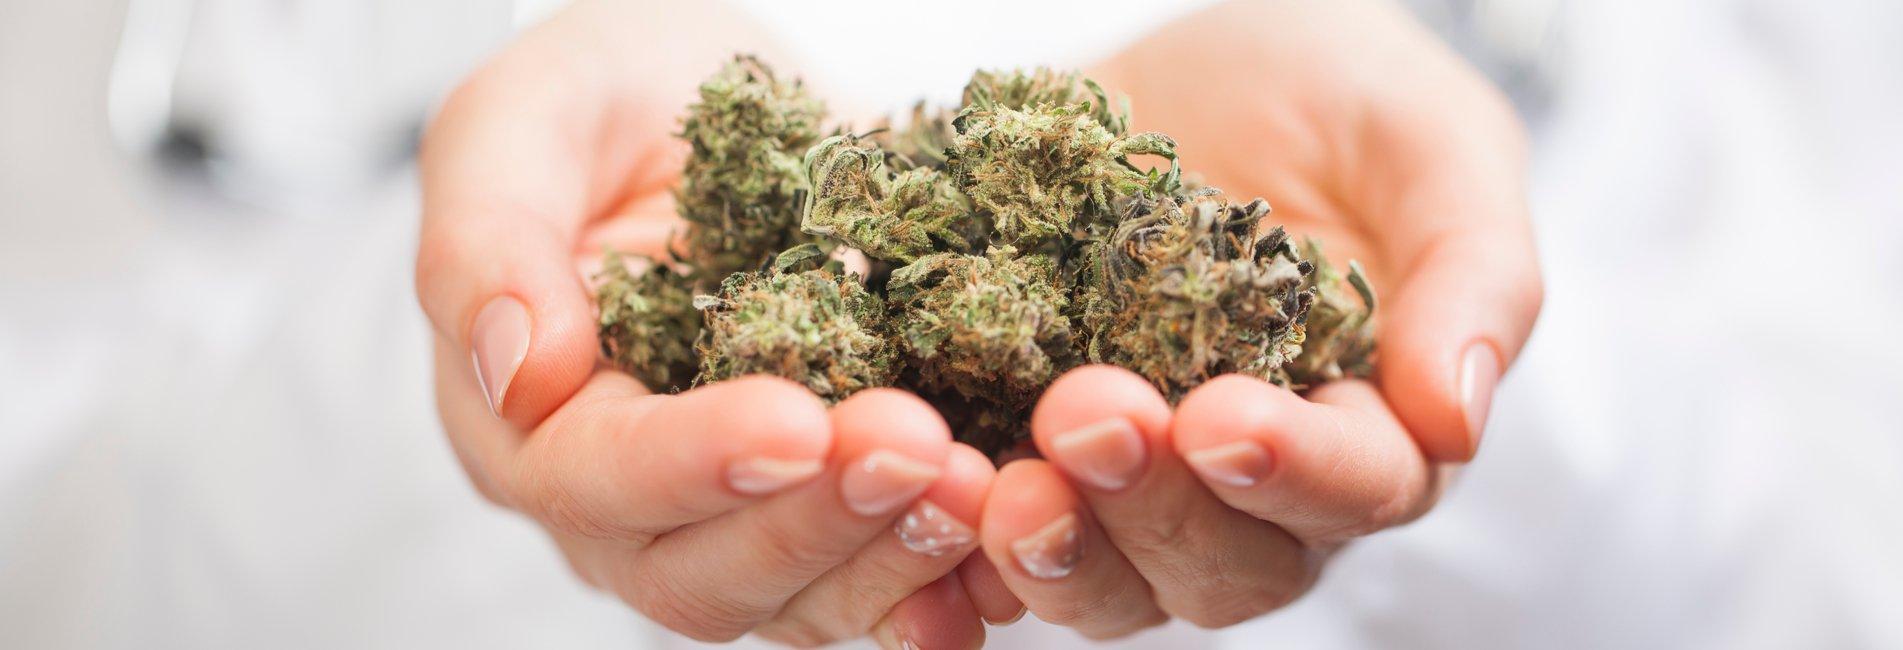 Marijuana Symptoms Signs Resurgence - An image of marijuana. It's very important to recognize marijuana symptoms and signs of addiction and then seeking help.